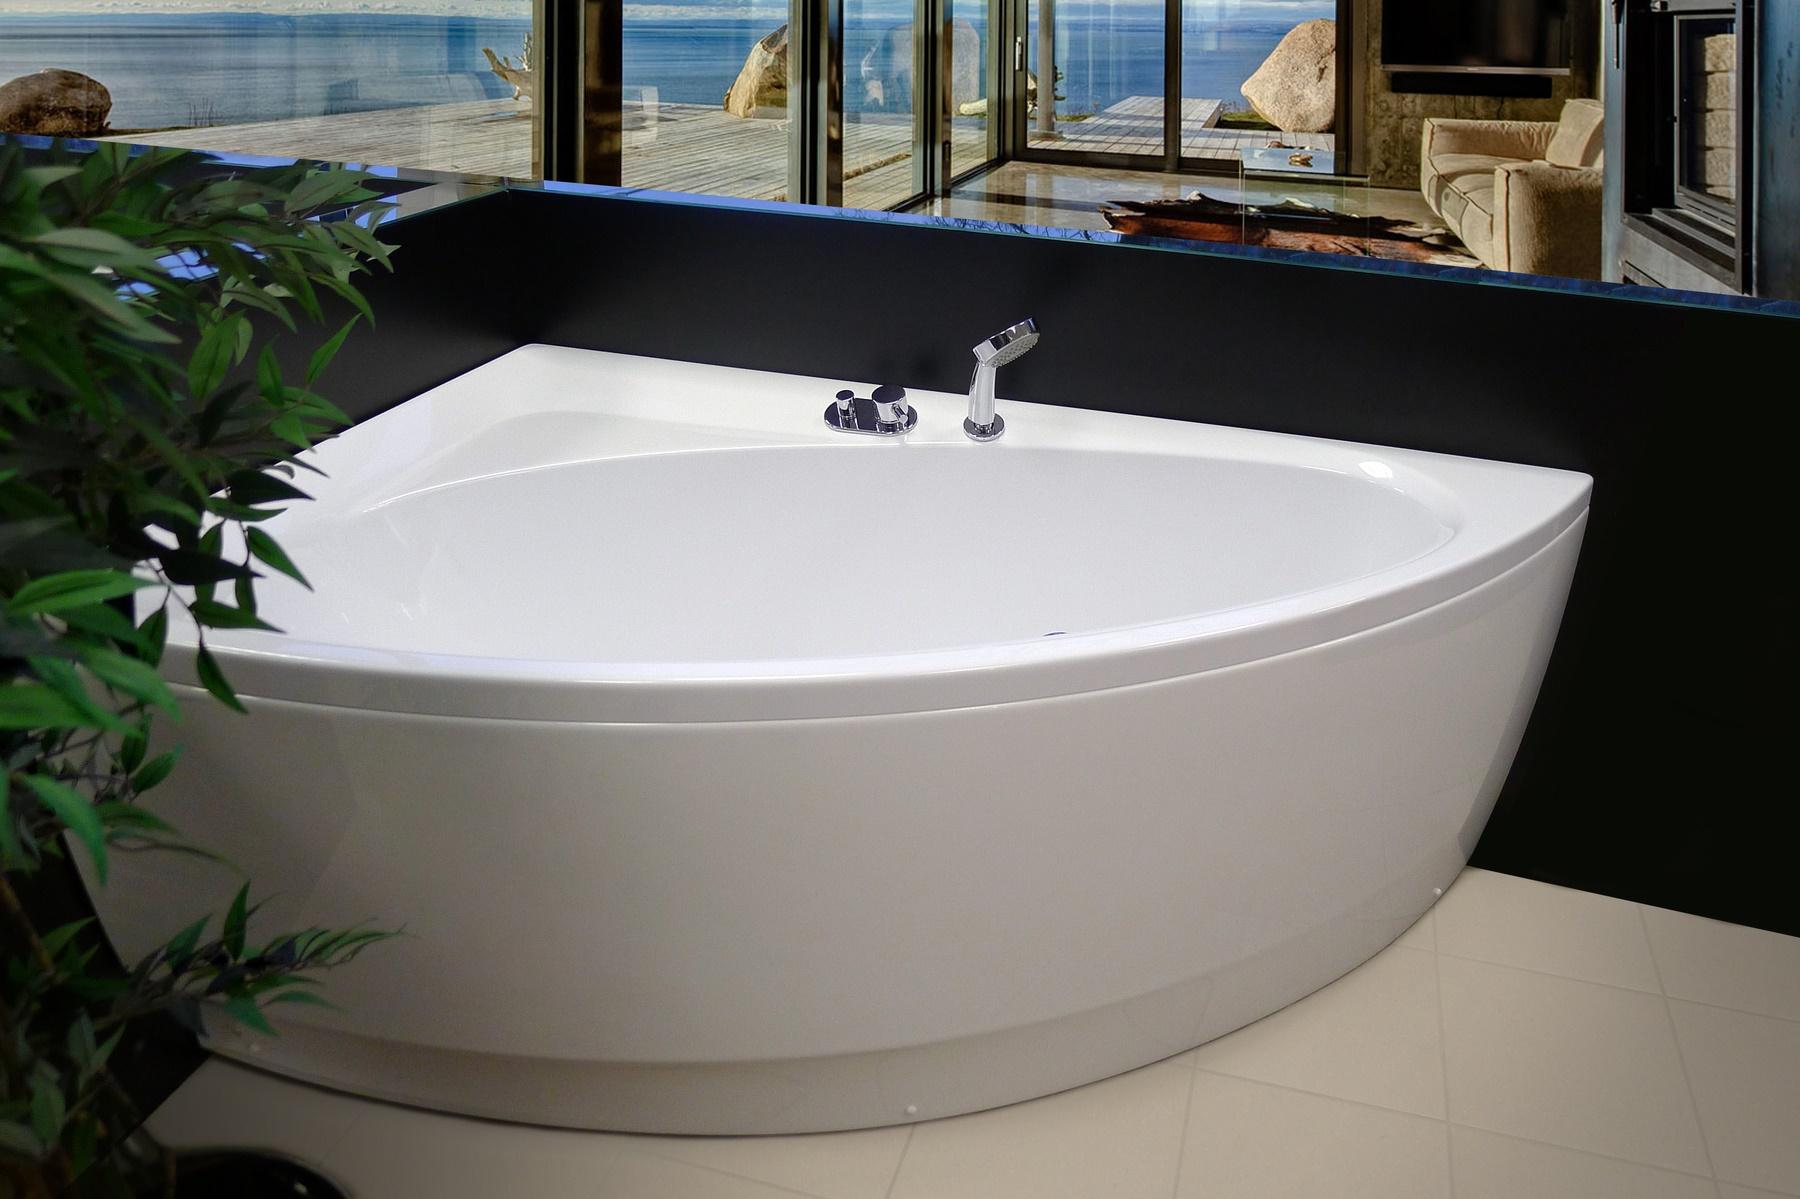 Aquatica idea r wht corner acrylic bathtub for Freestanding tub vs built in